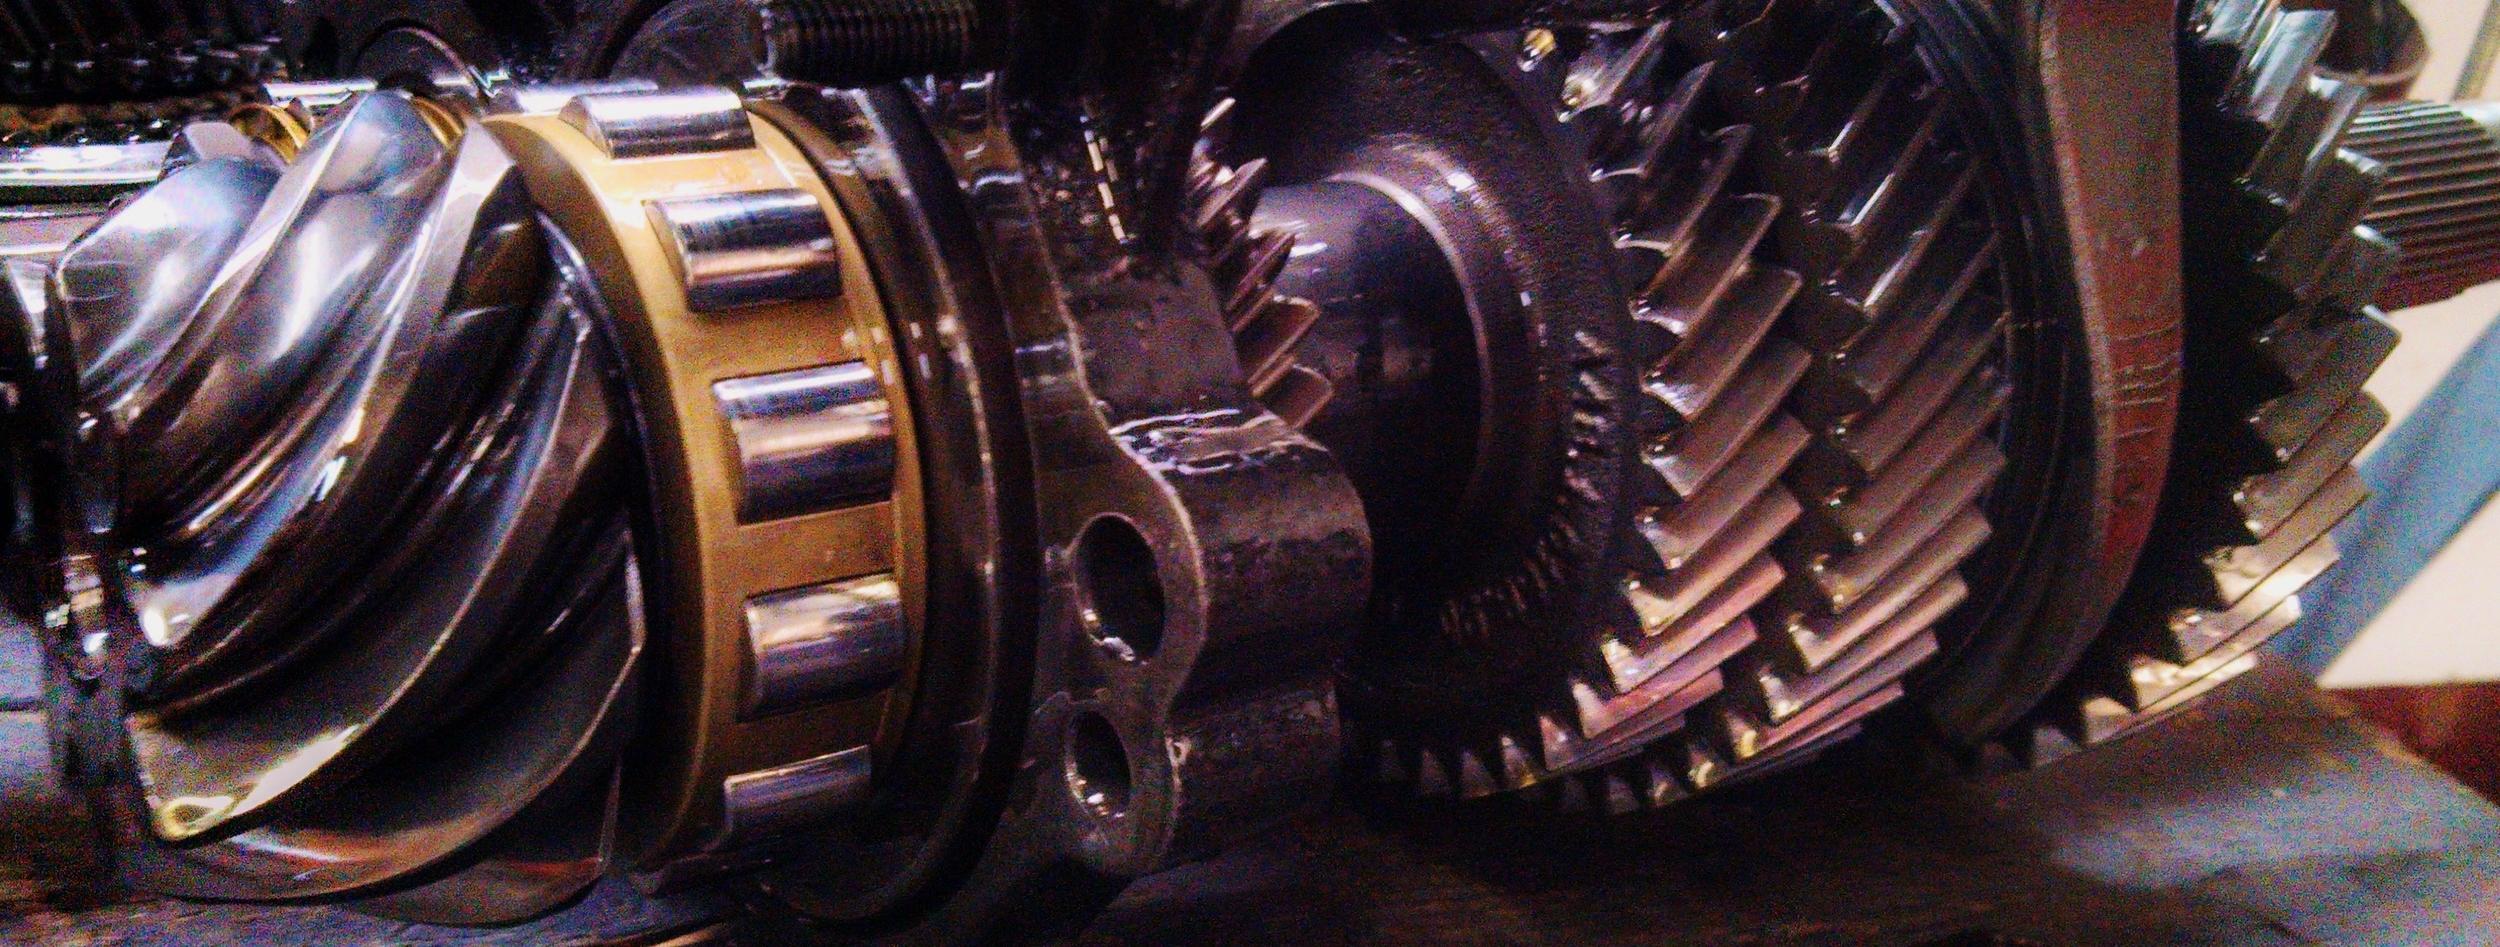 turbo transmission.jpg